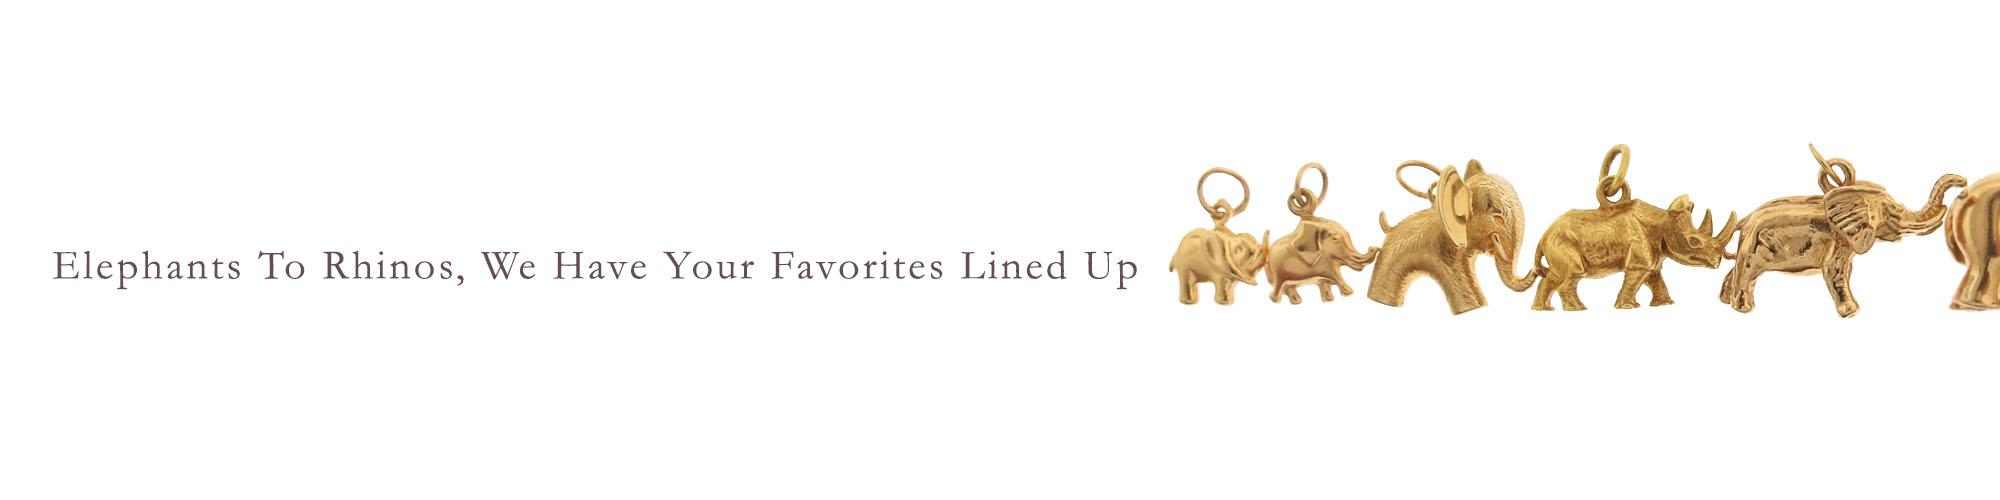 elephantstorhinosfavorites.jpg